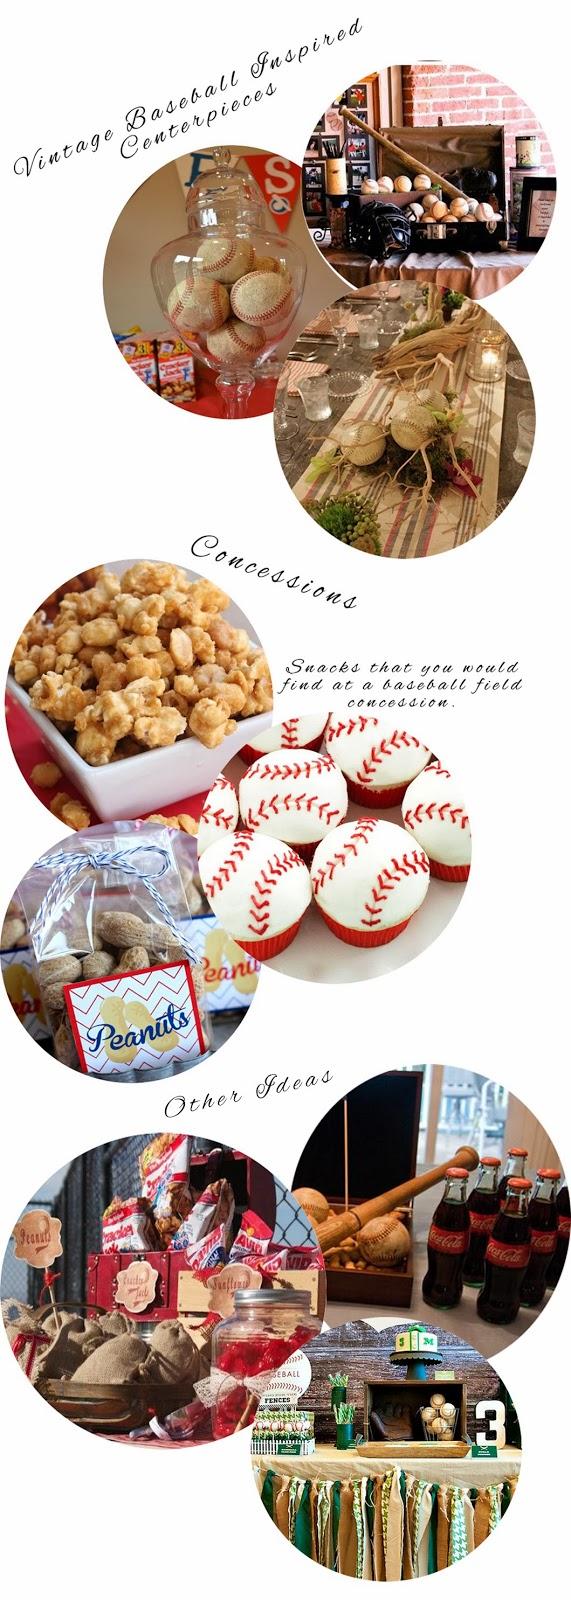 vintage, baseball, tabeltop, tablescape, concessions, vintage baseball